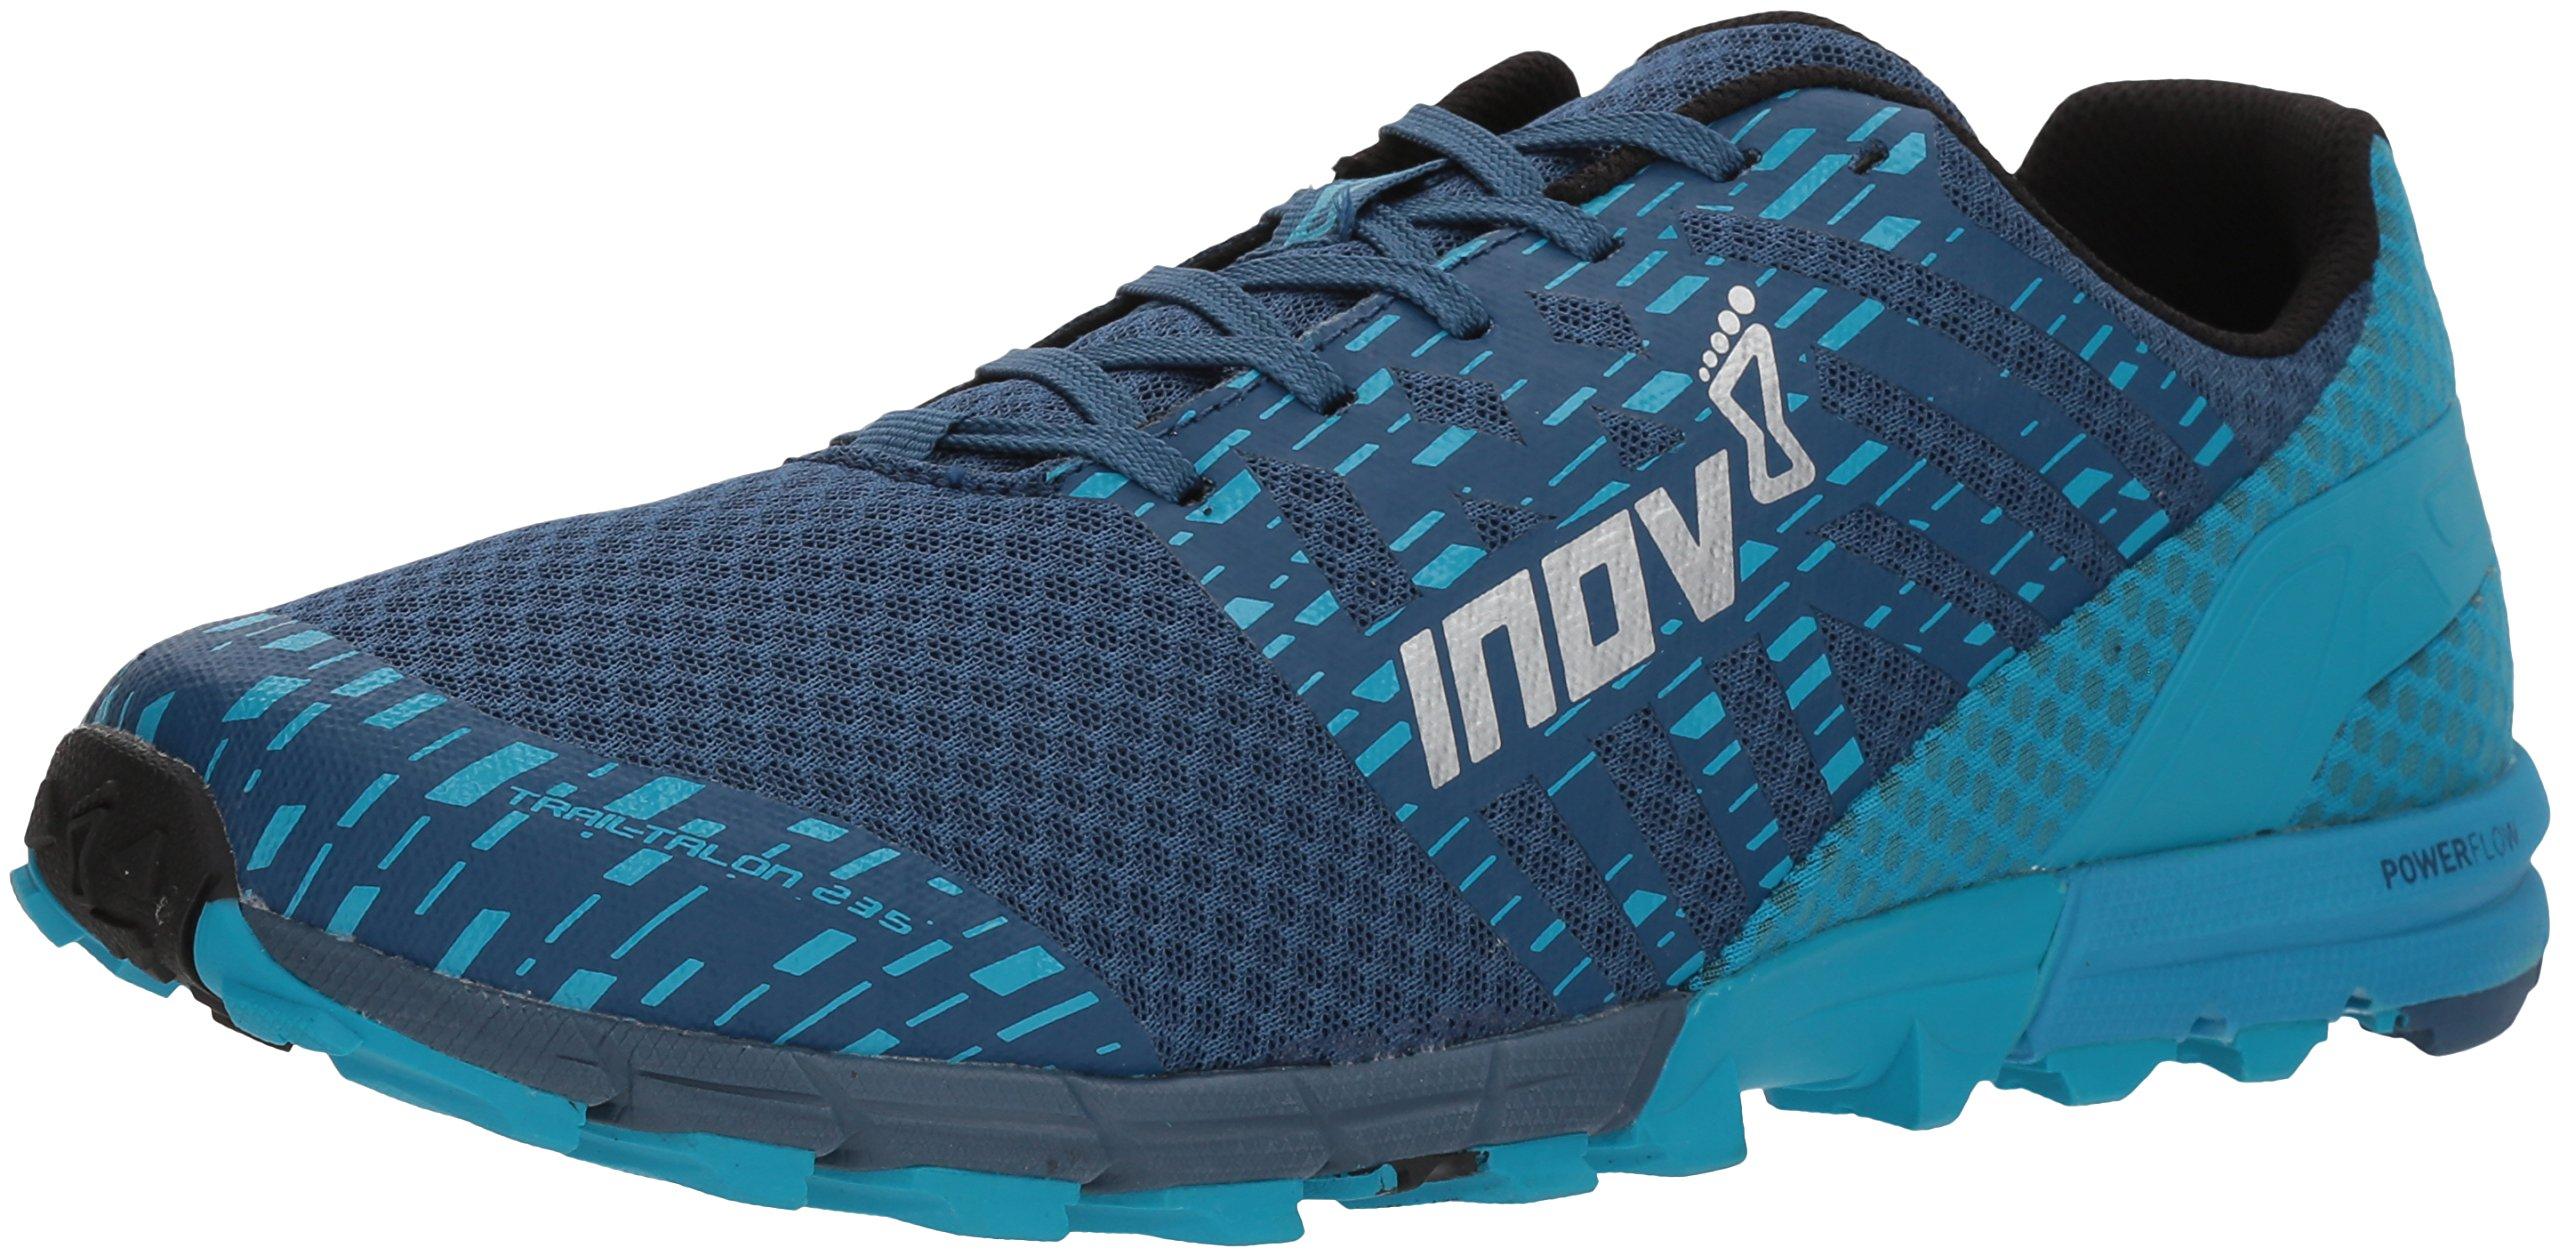 Inov-8 Men's Trailtalon 235 (M) Trail Running Shoe, Blue, 12.5 D US